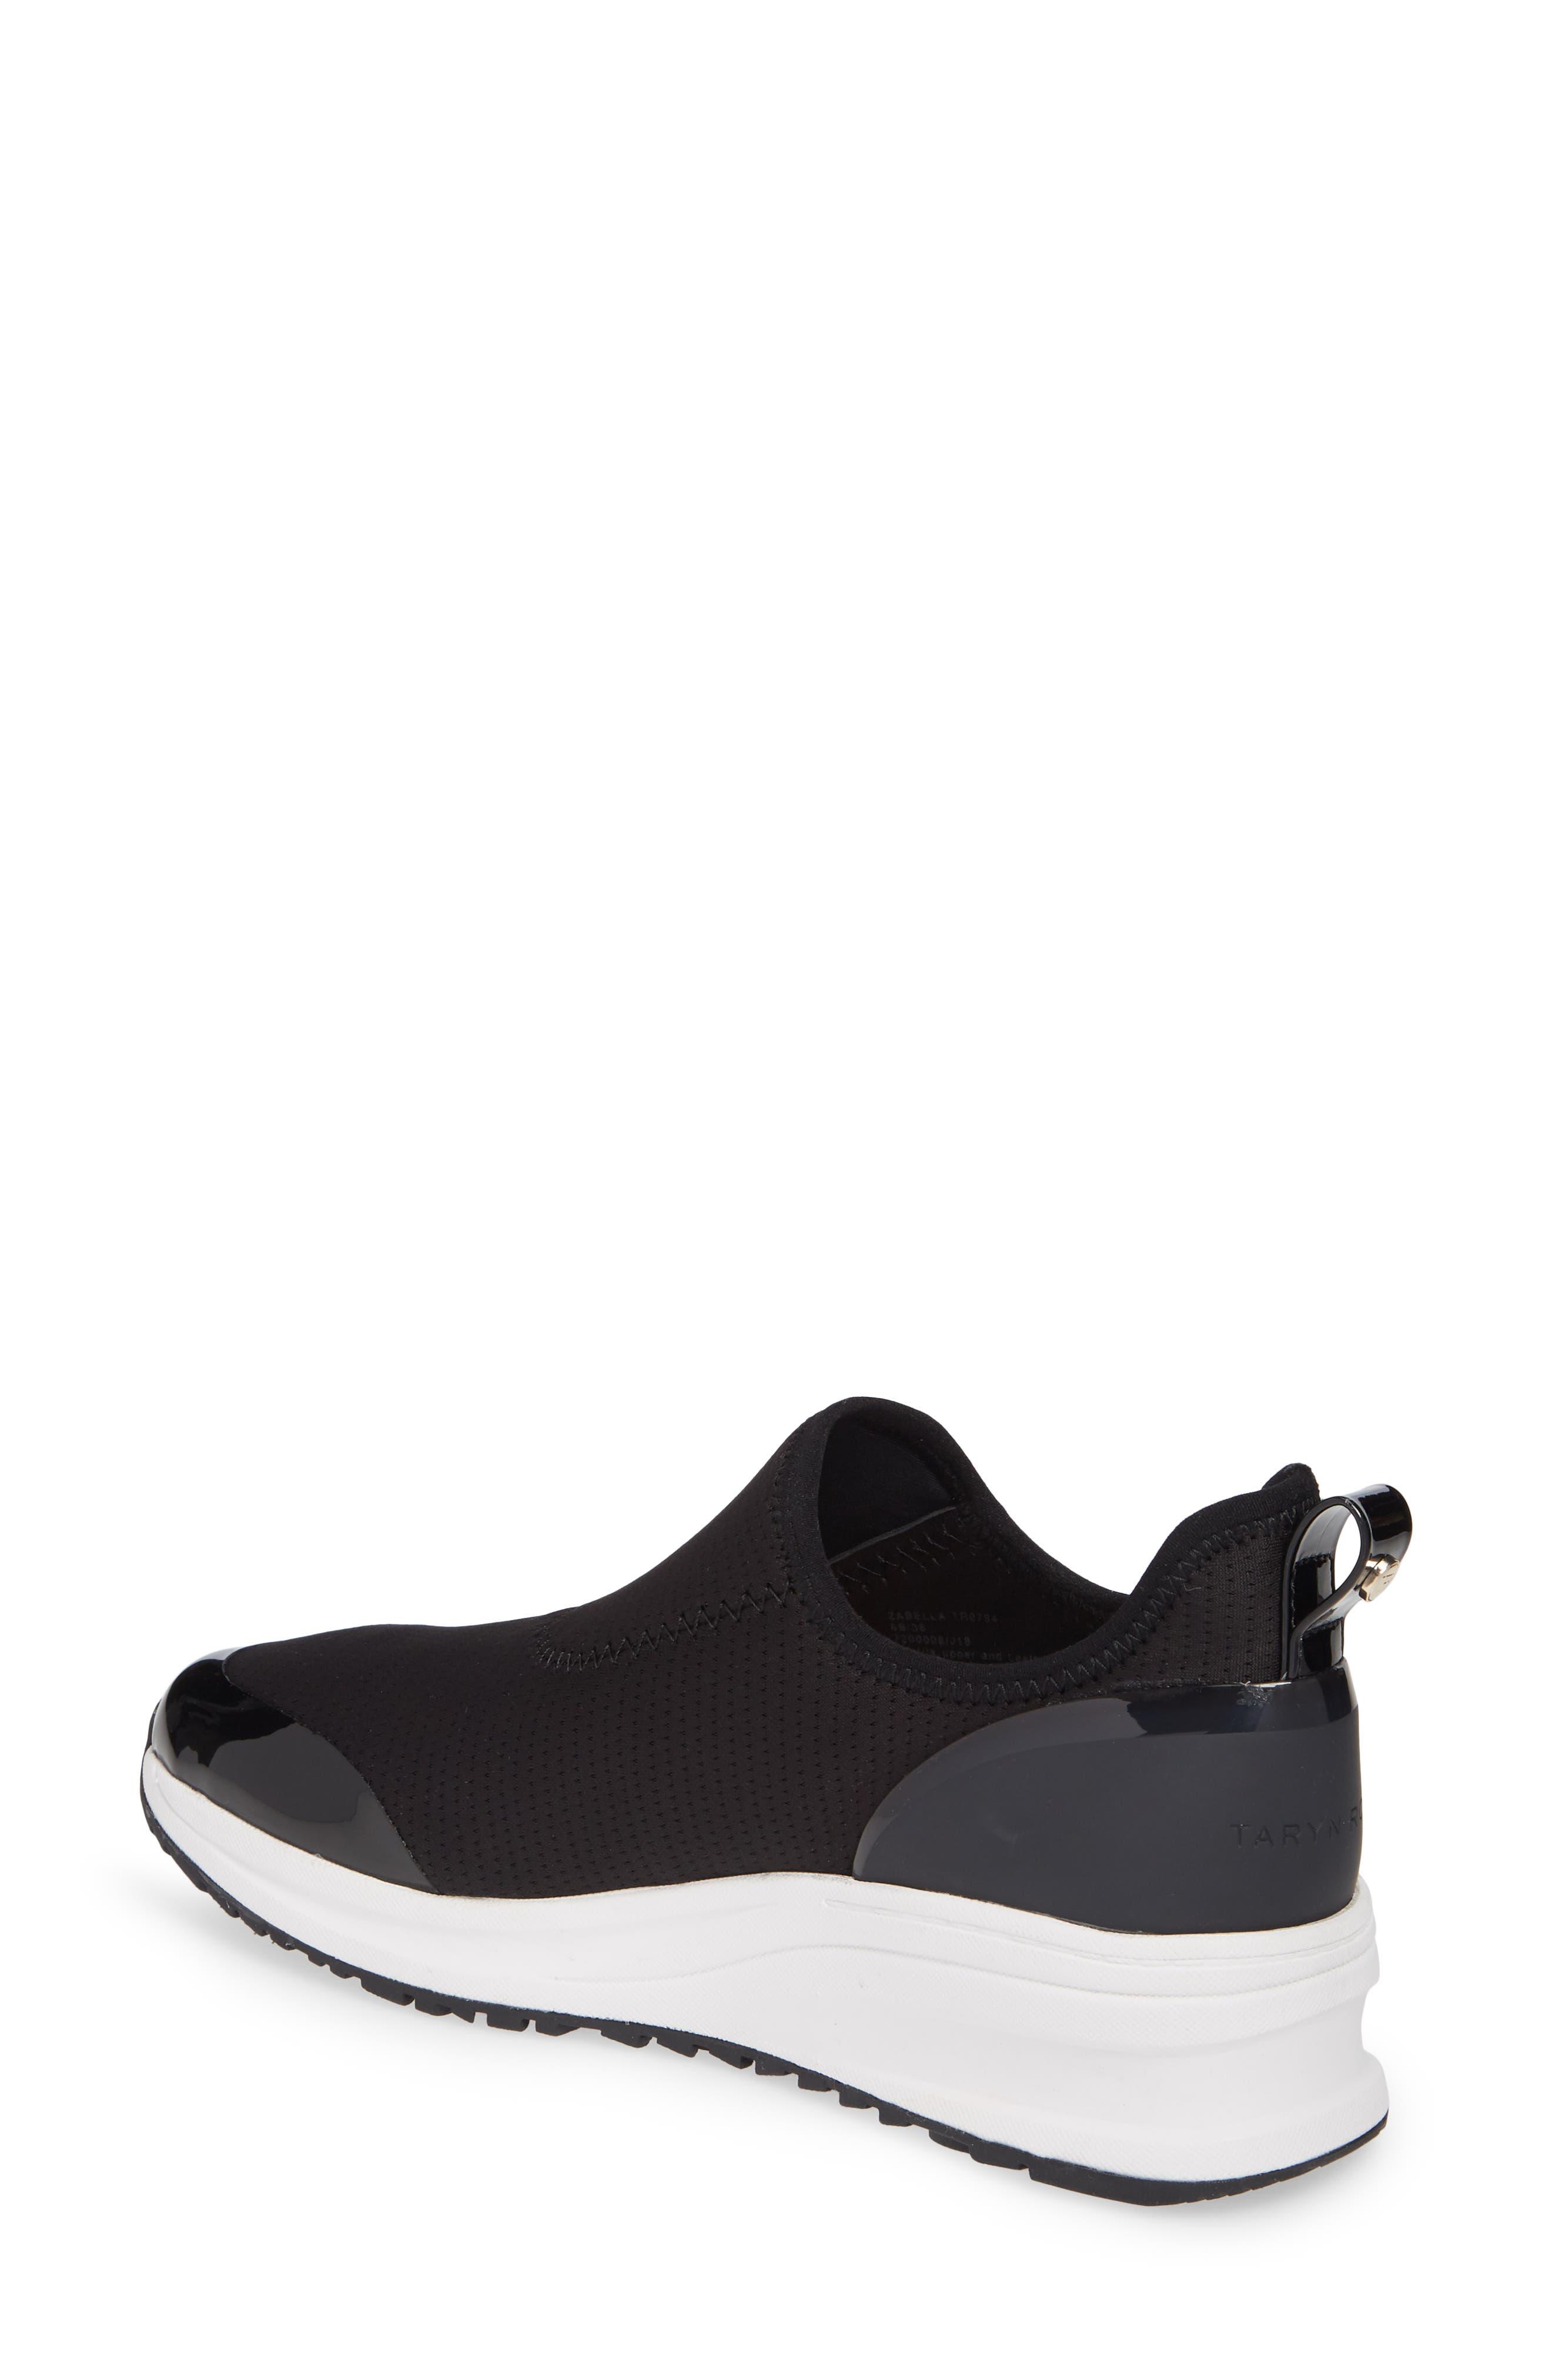 TARYN ROSE, Zabella Slip-On Sneaker, Alternate thumbnail 2, color, BLACK STRETCH FABRIC